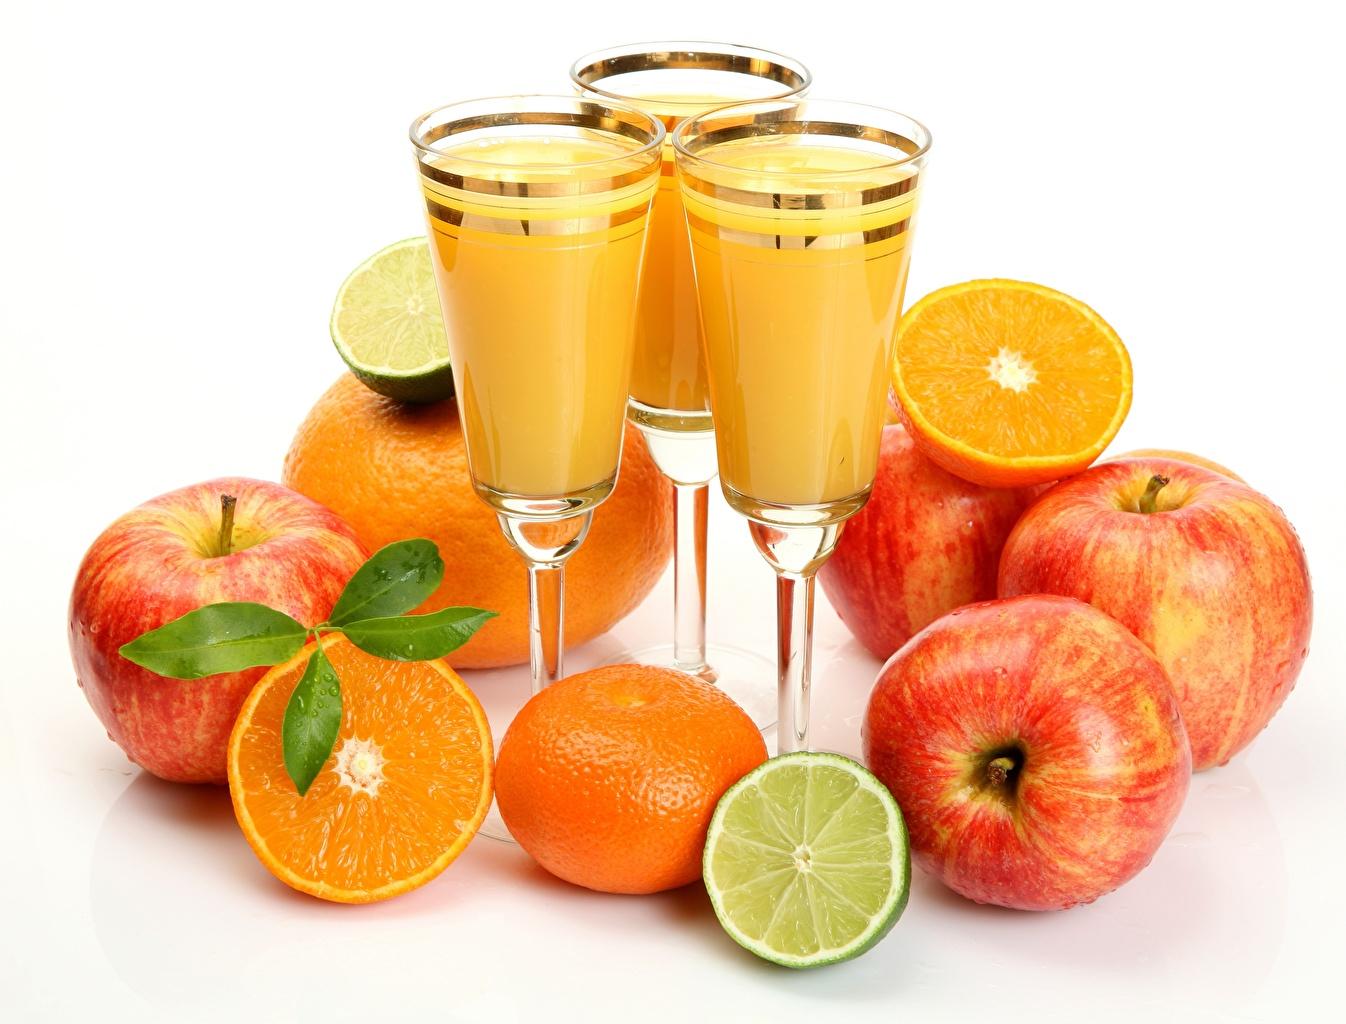 Image Lime Juice Orange fruit Apples Food Fruit Stemware